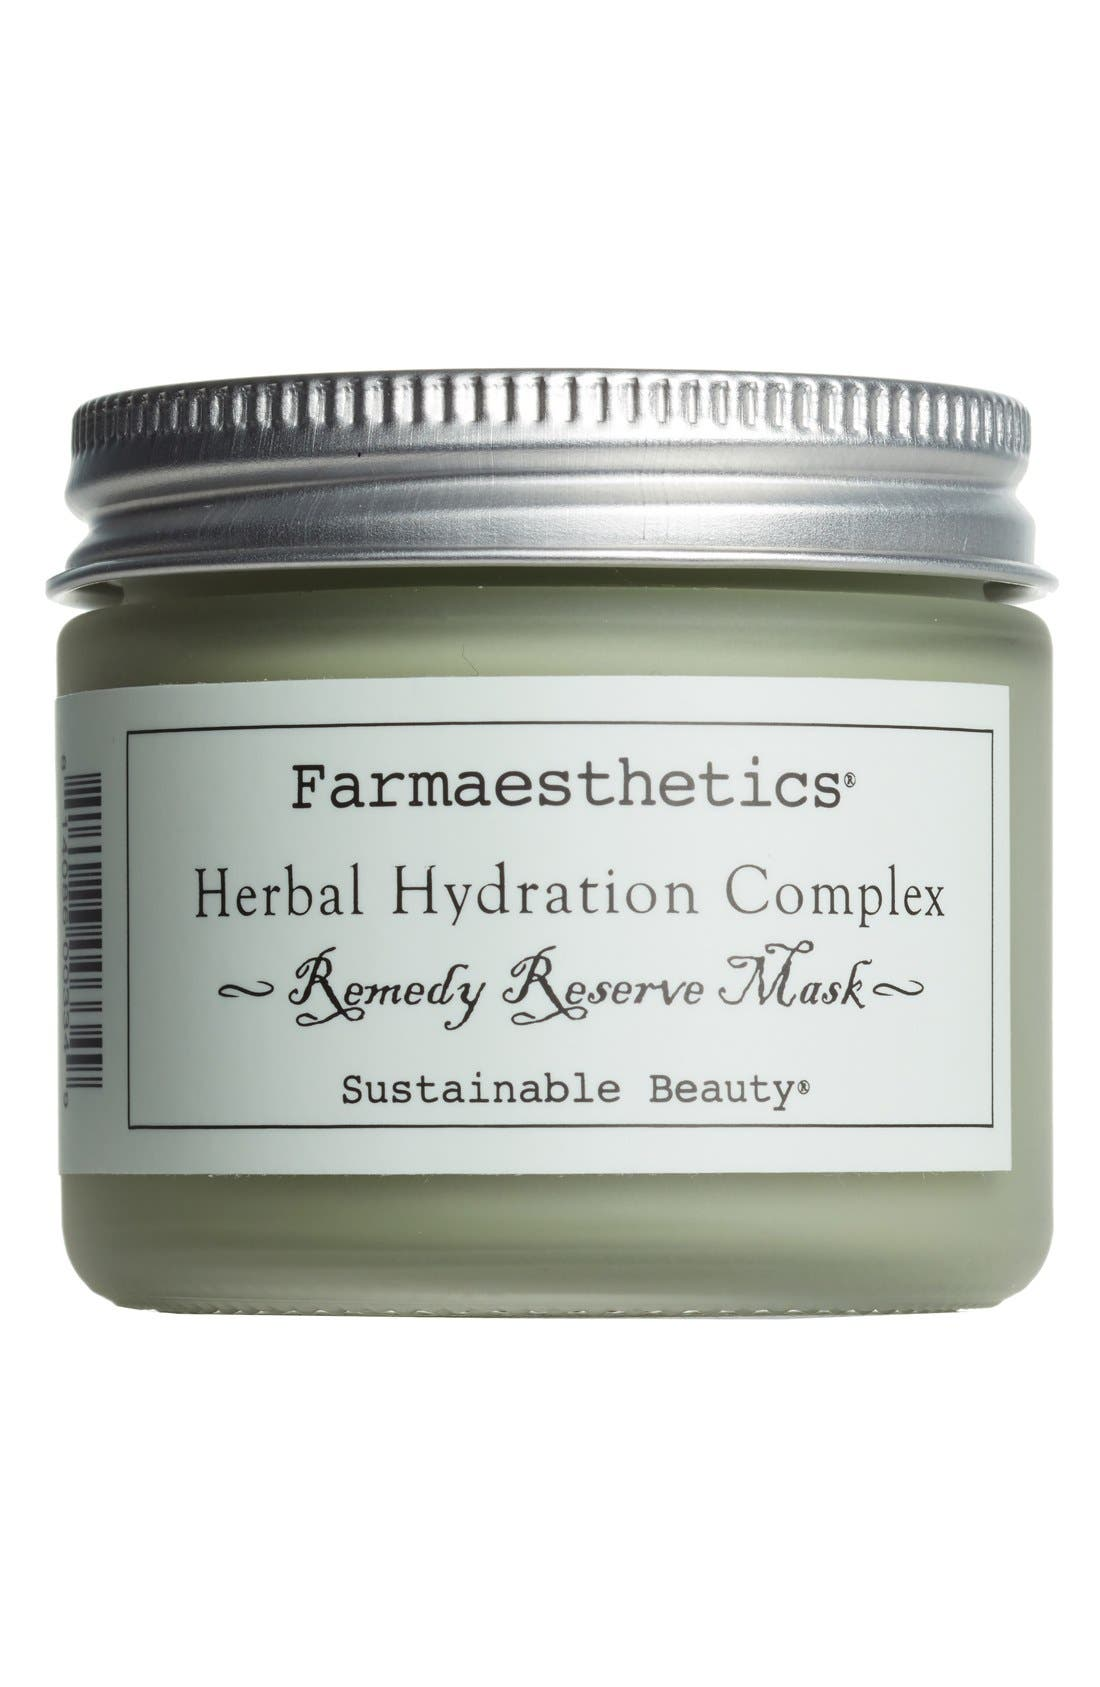 Farmaesthetics Herbal Hydration Complexion